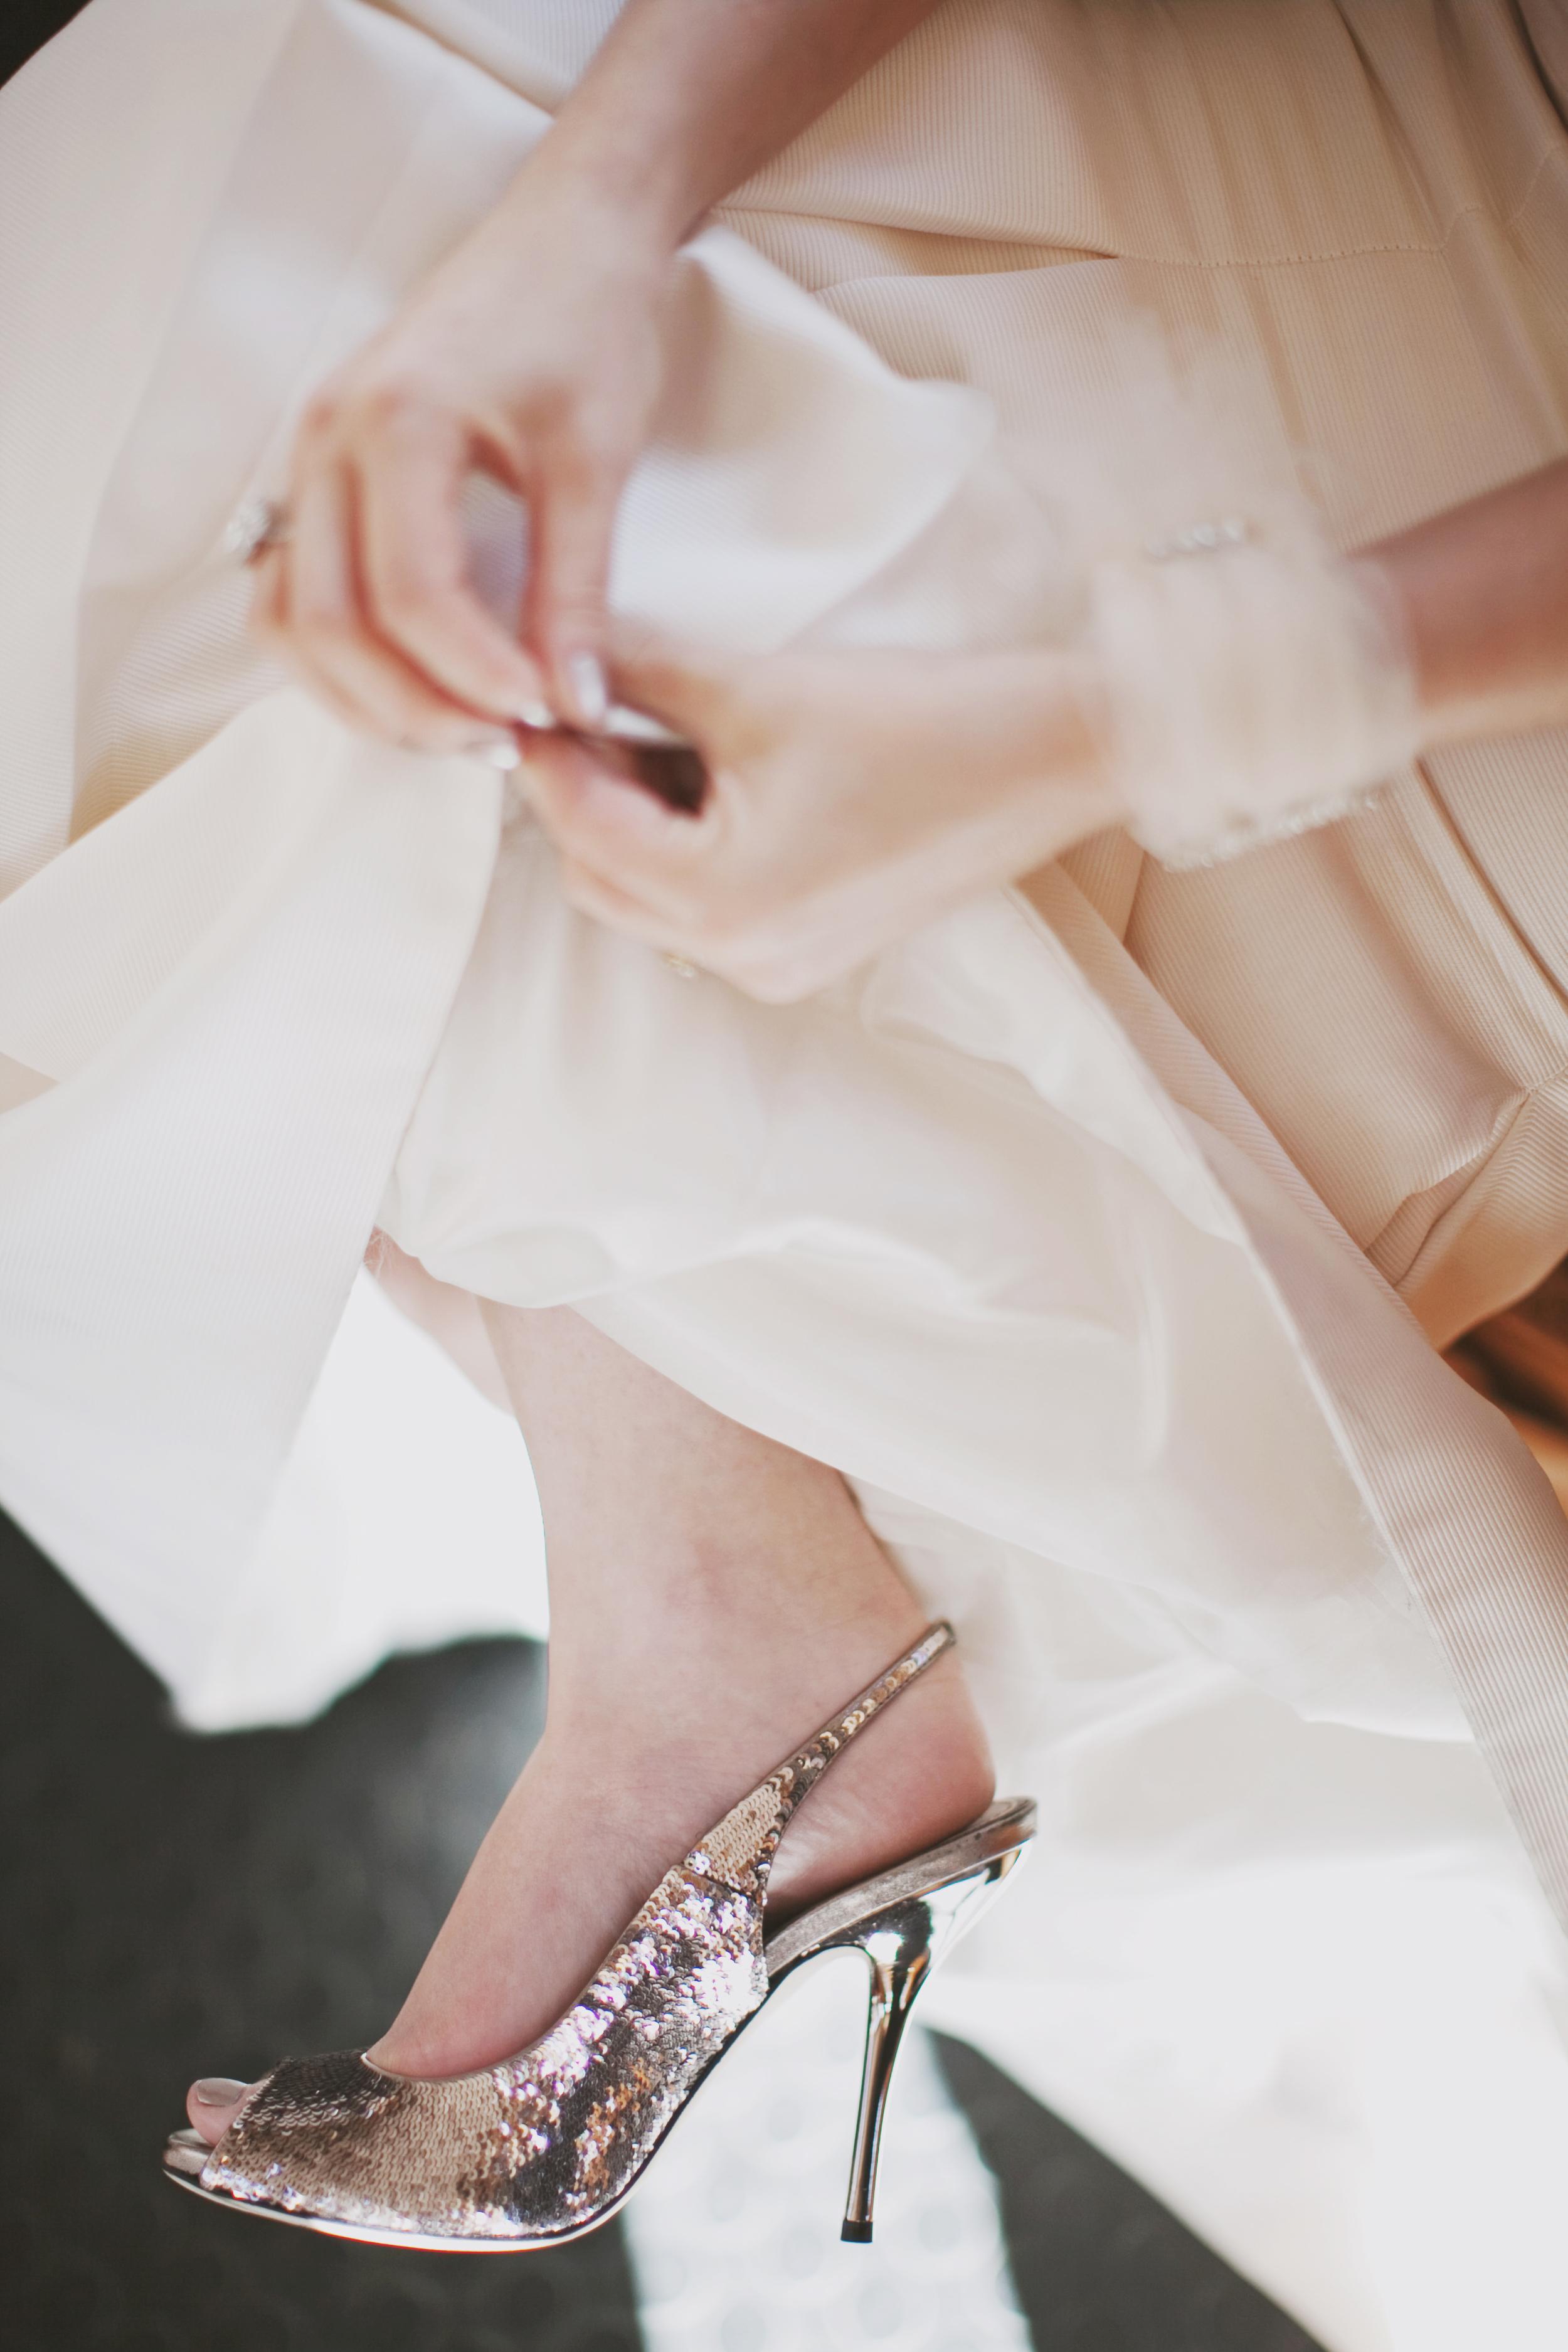 San_Francisco_City_Hall_Wedding_Photography_Cori_EB-16.JPG